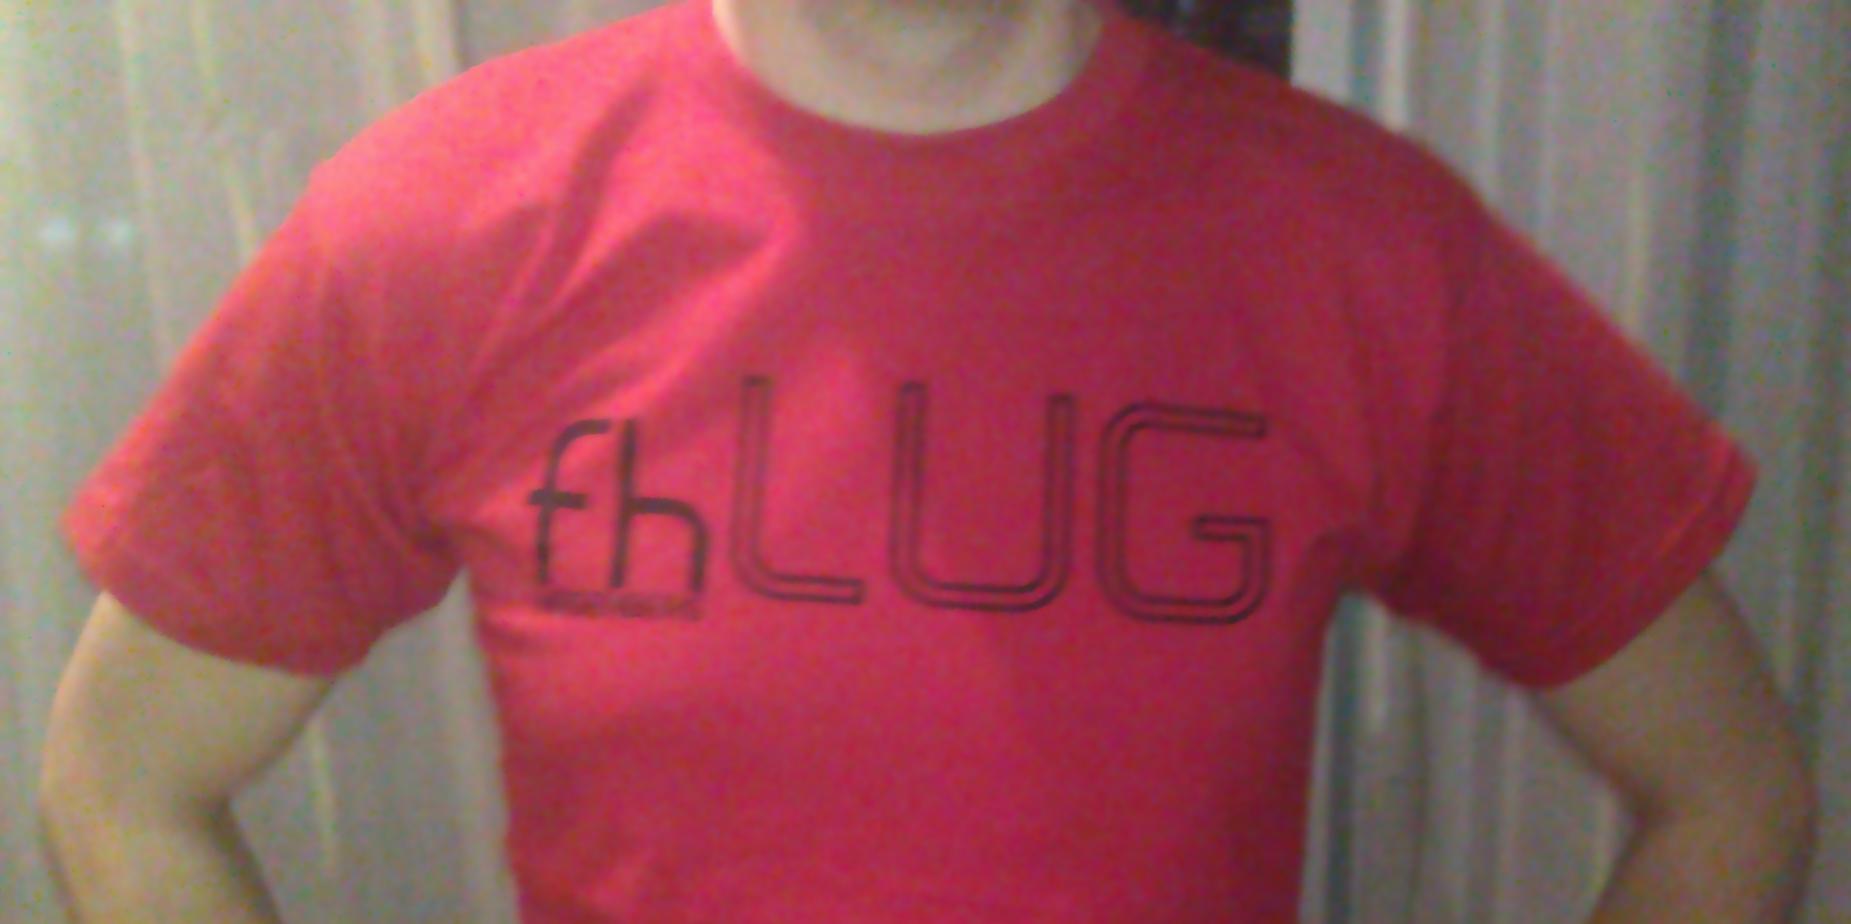 fhLUG T-Shirt